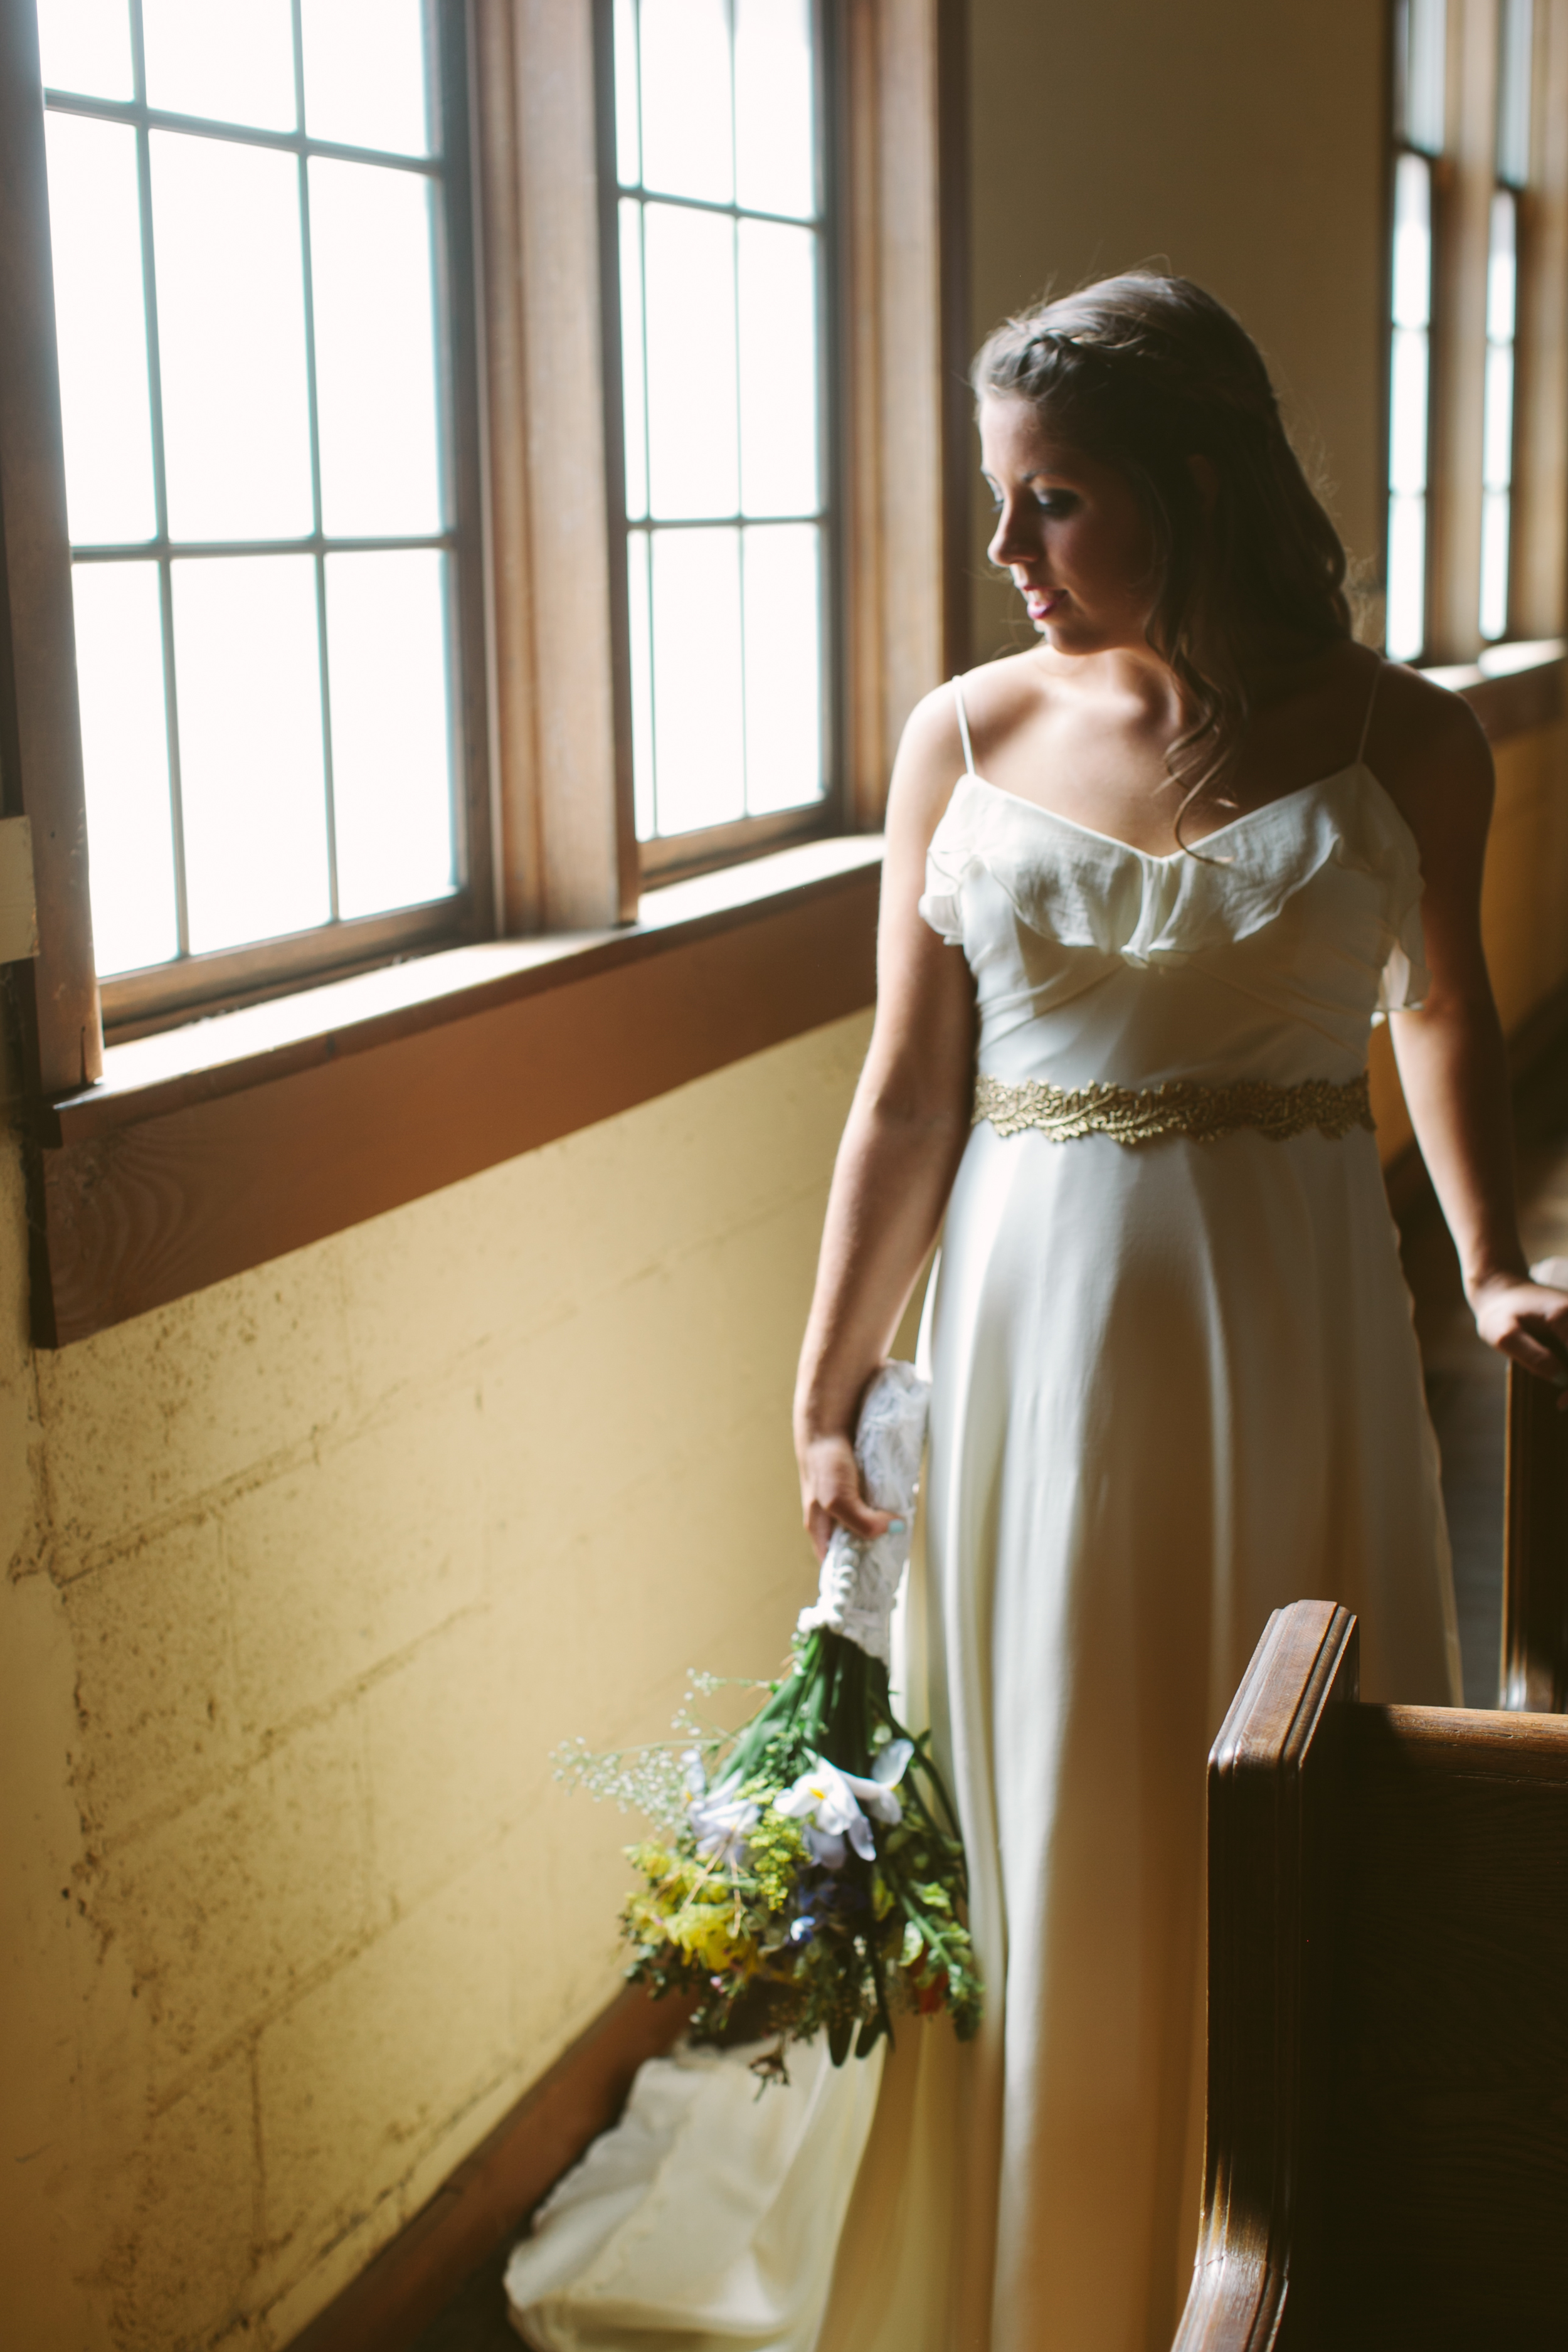 Kathryn-McCrary-Photography-Atlanta-Wedding-Photographer-11.jpg